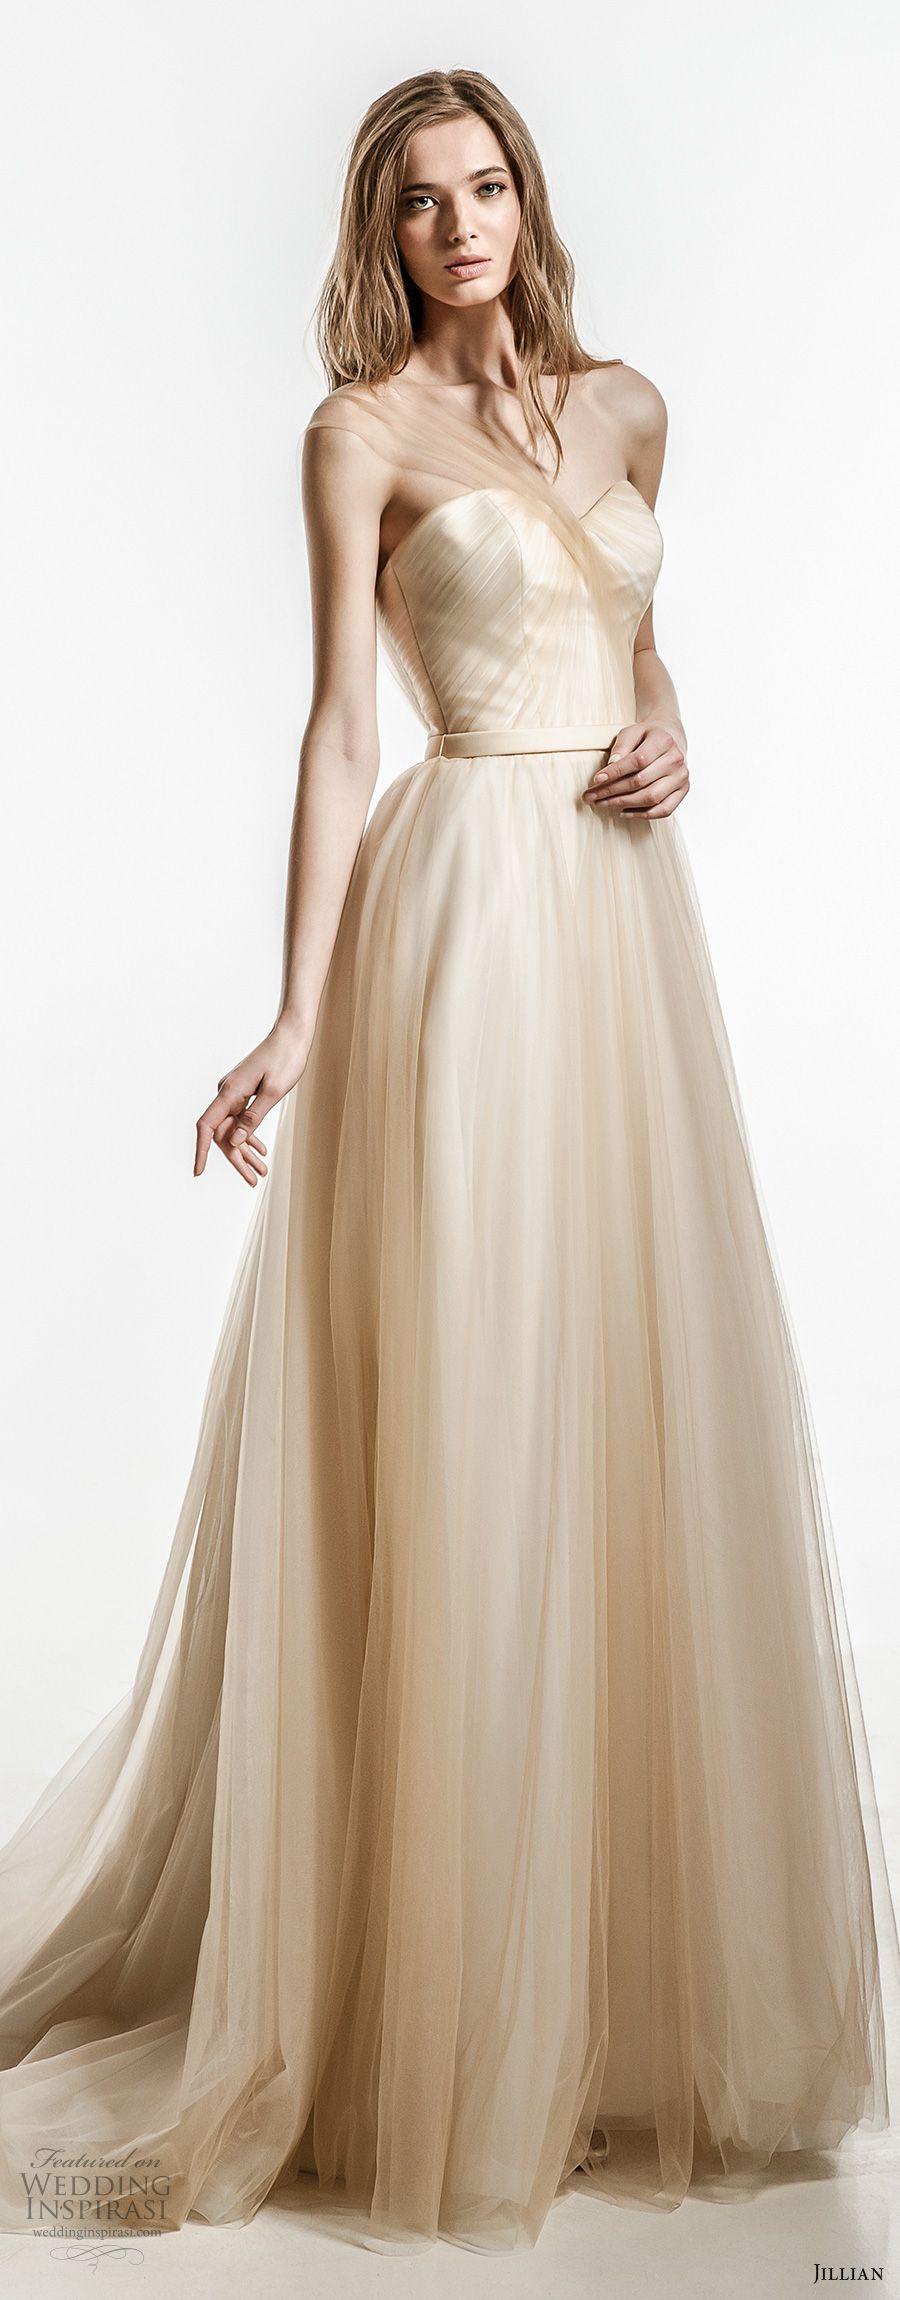 Jillian 2018 Wedding Dresses | Champagne colour, Champagne and Neckline